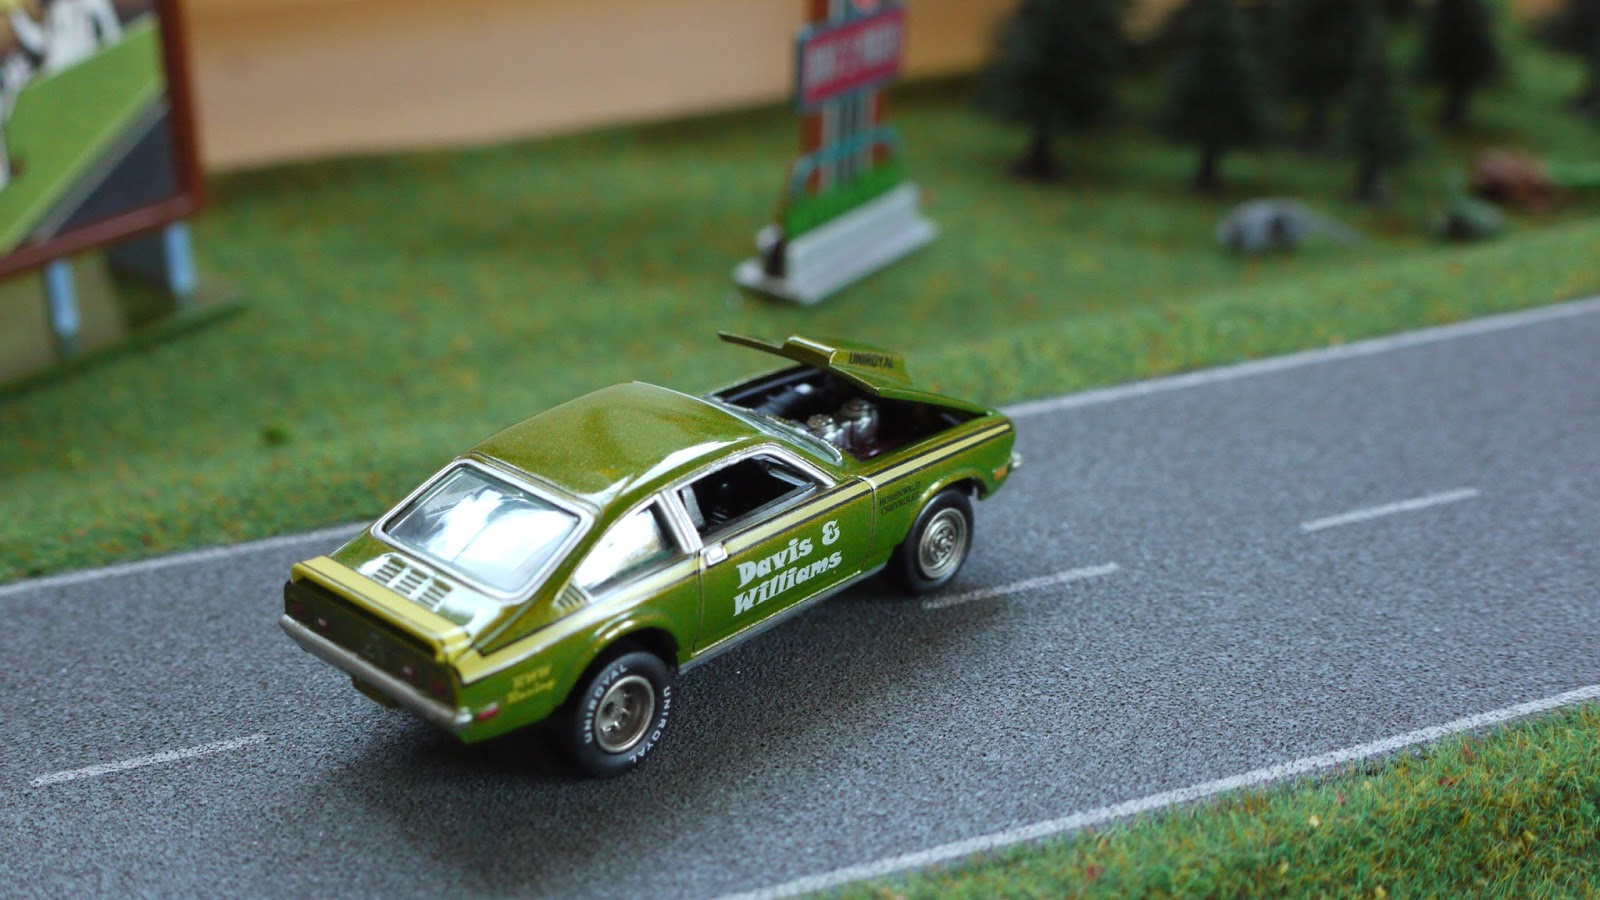 Diecast cars 1/64, Modellautos 1:64, Modellbilar 1:64: Chevrolet Vega